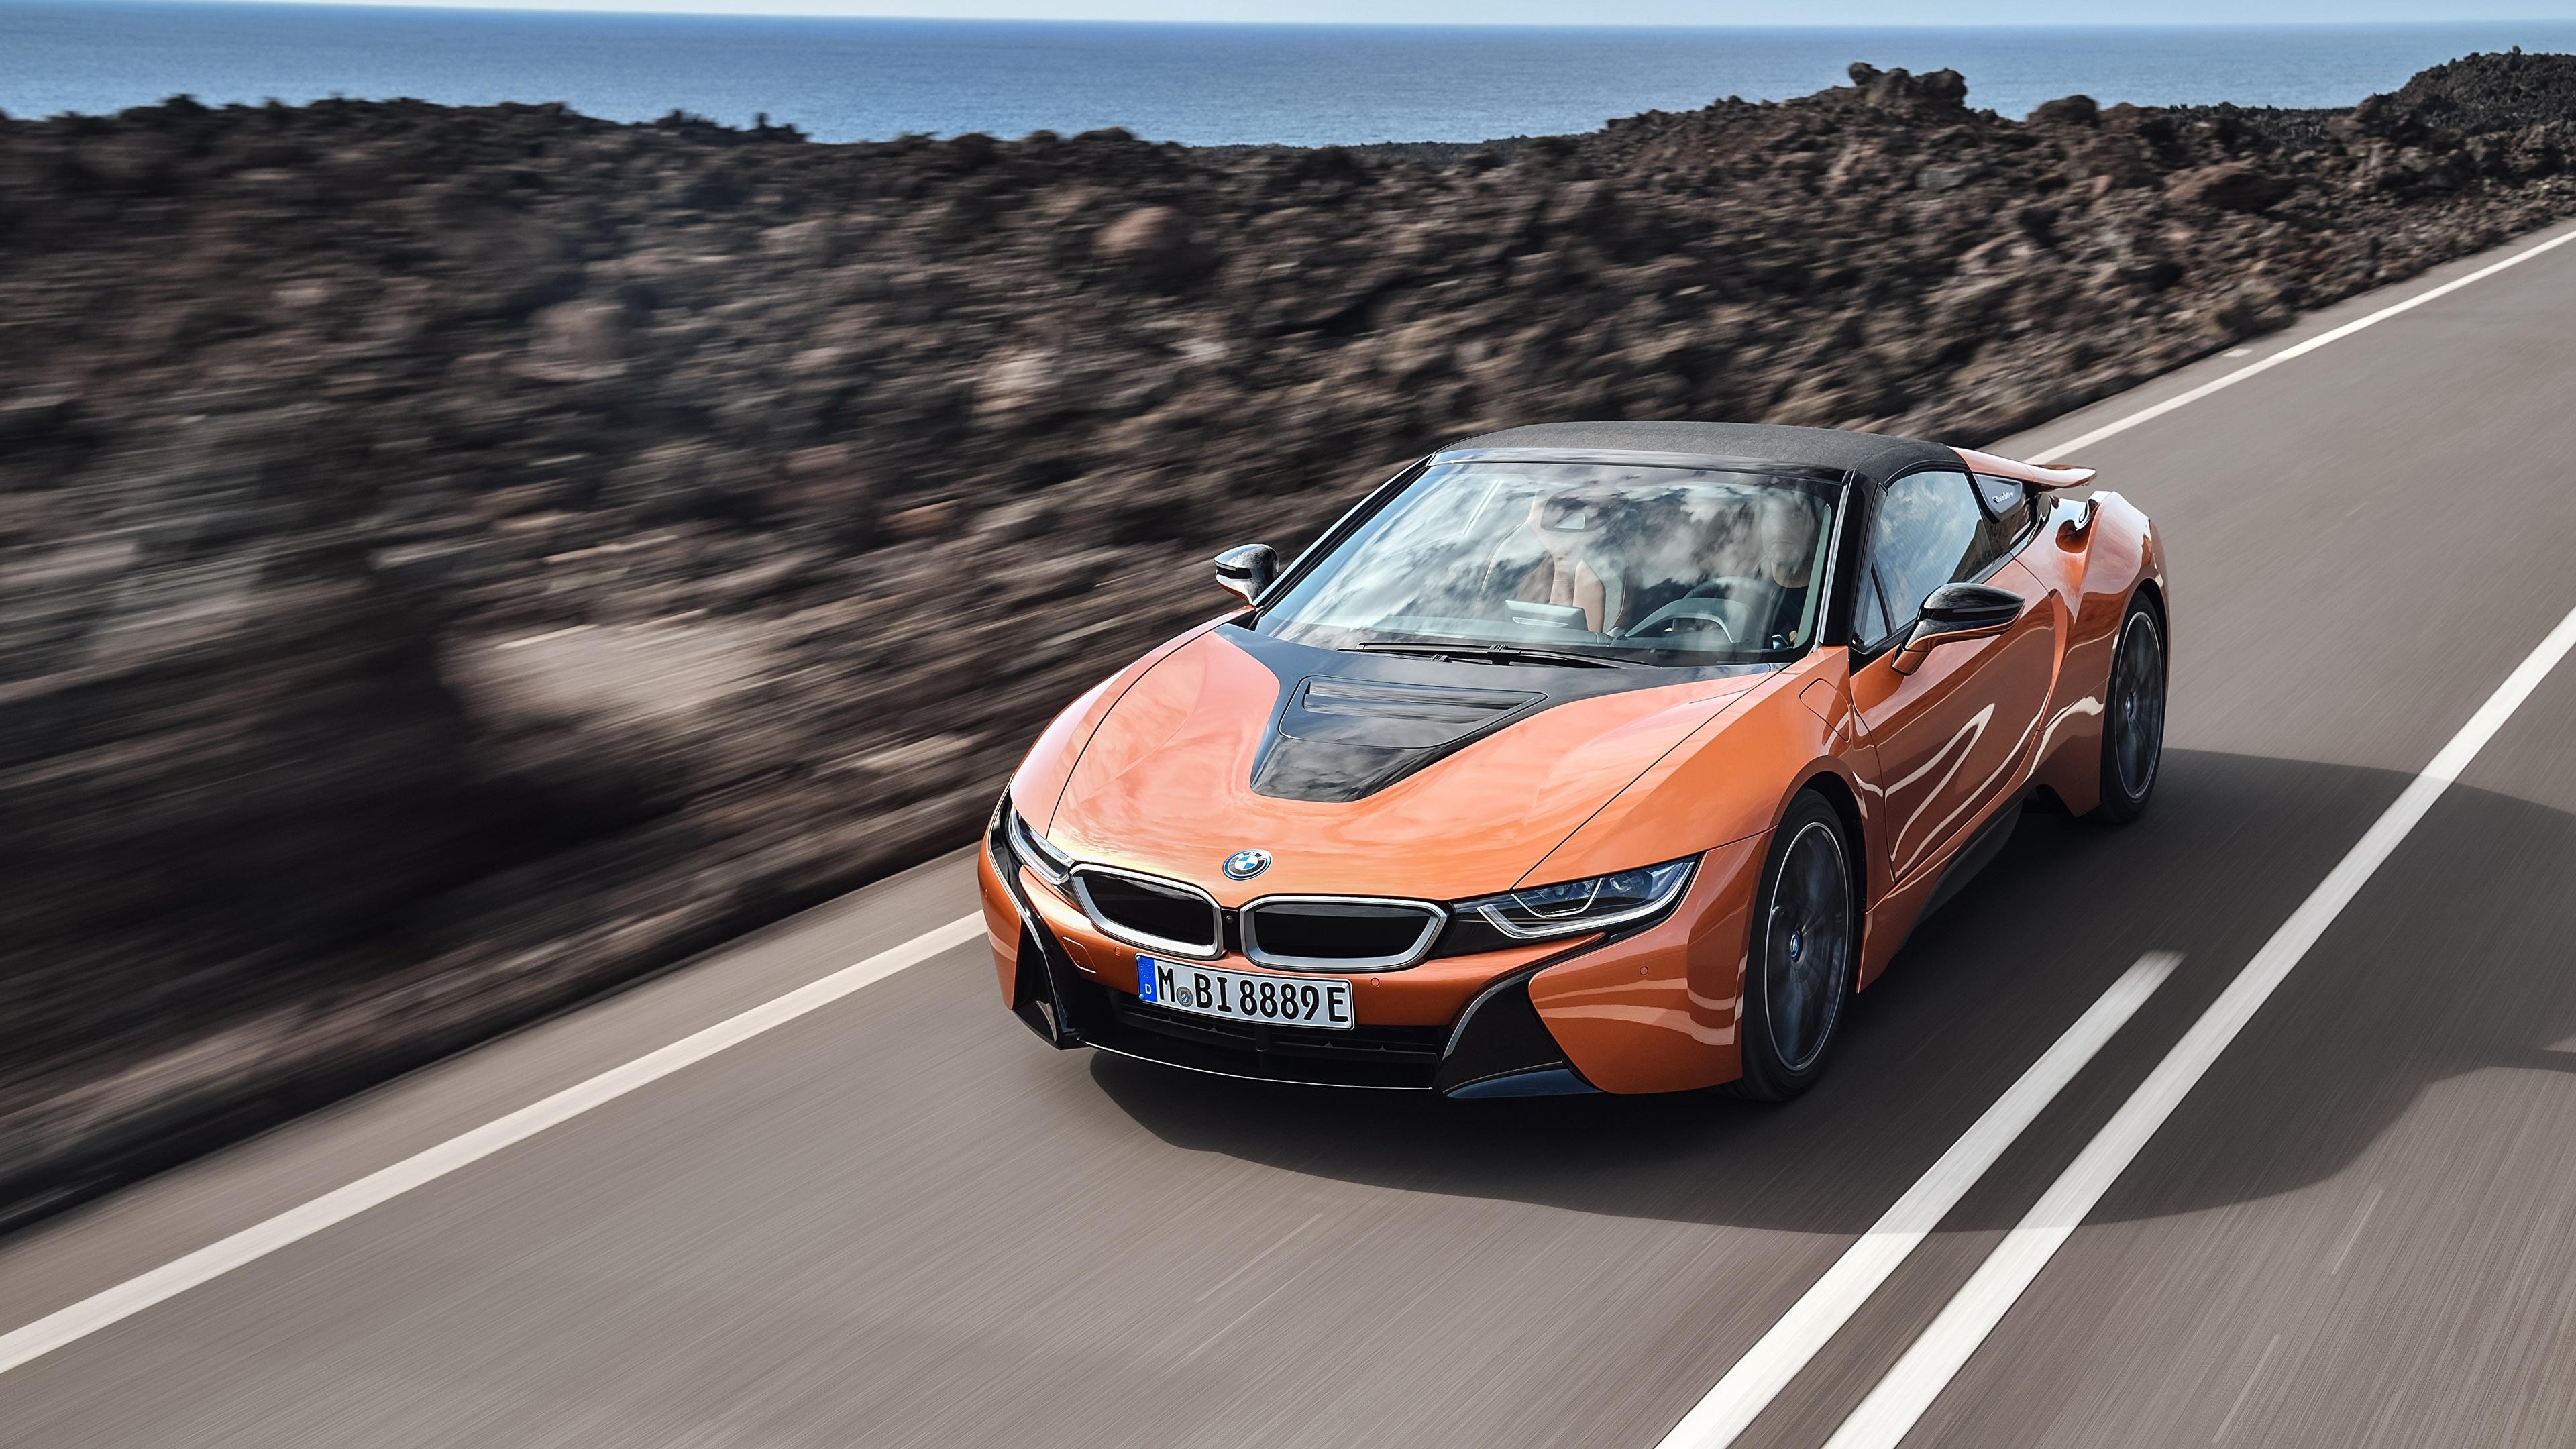 Photos Bmw I8 2018 Roadster Orange Motion Auto 3840x2160